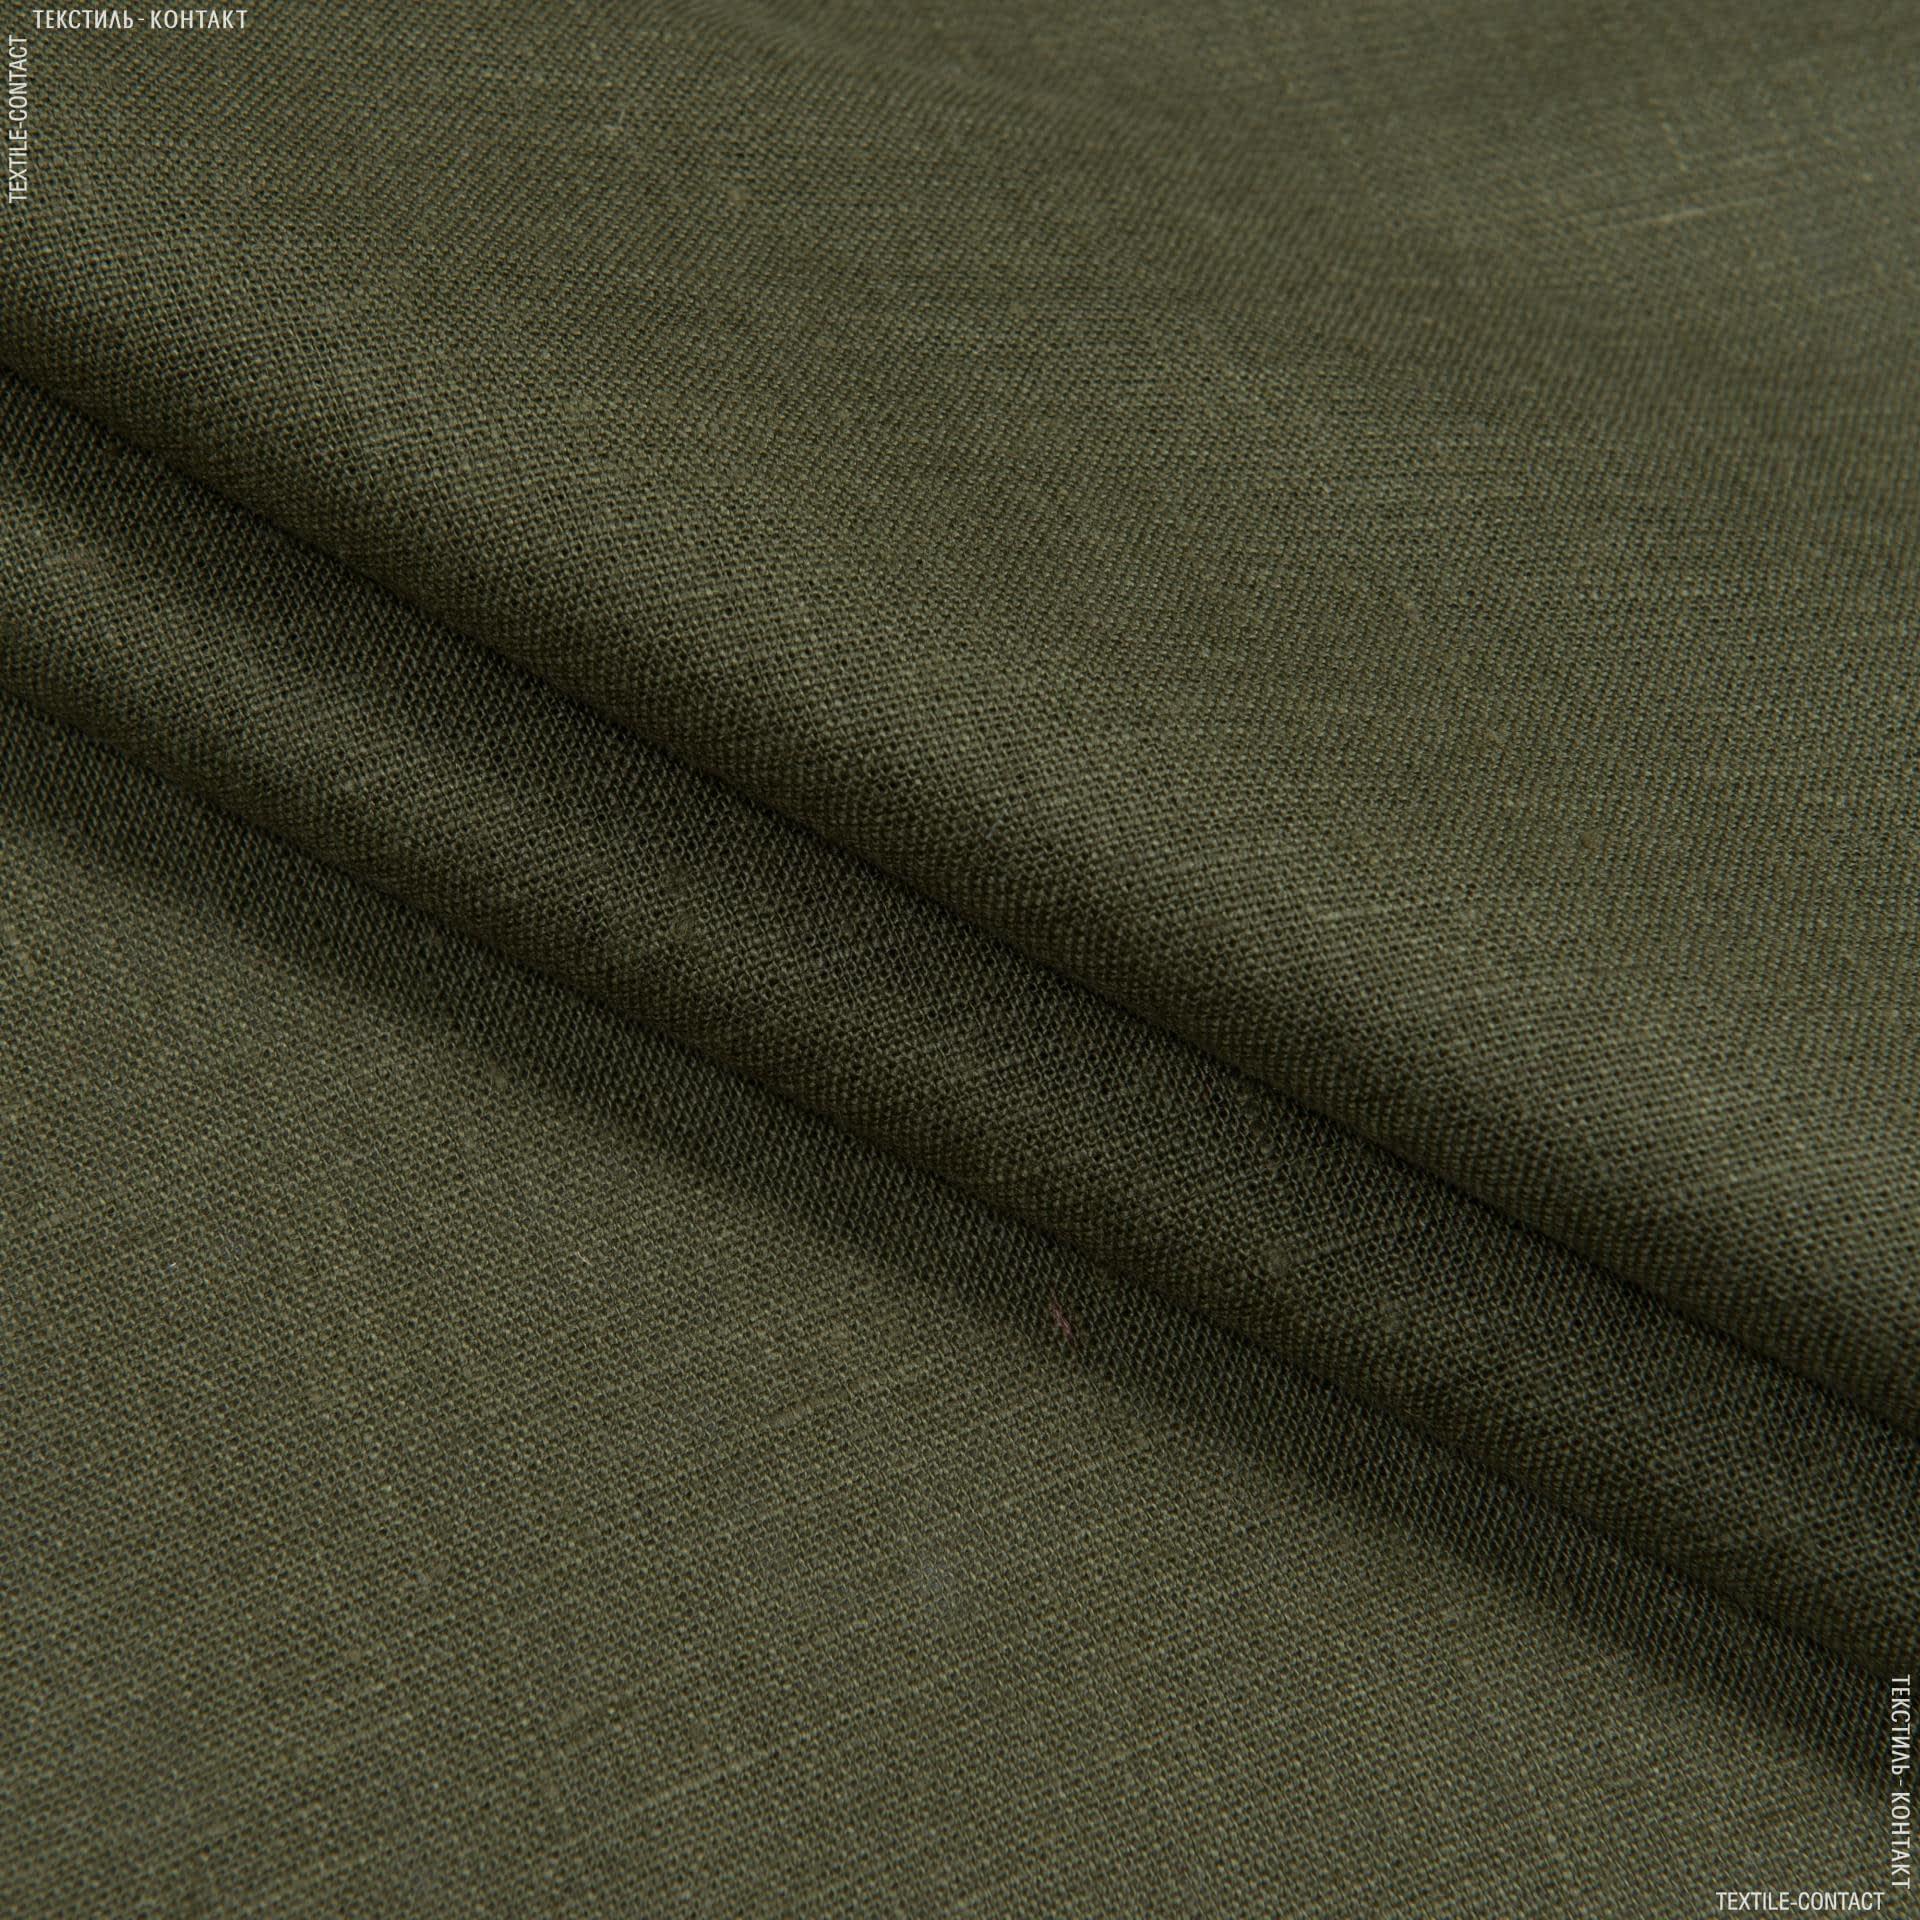 Ткани для брюк - Лен хаки